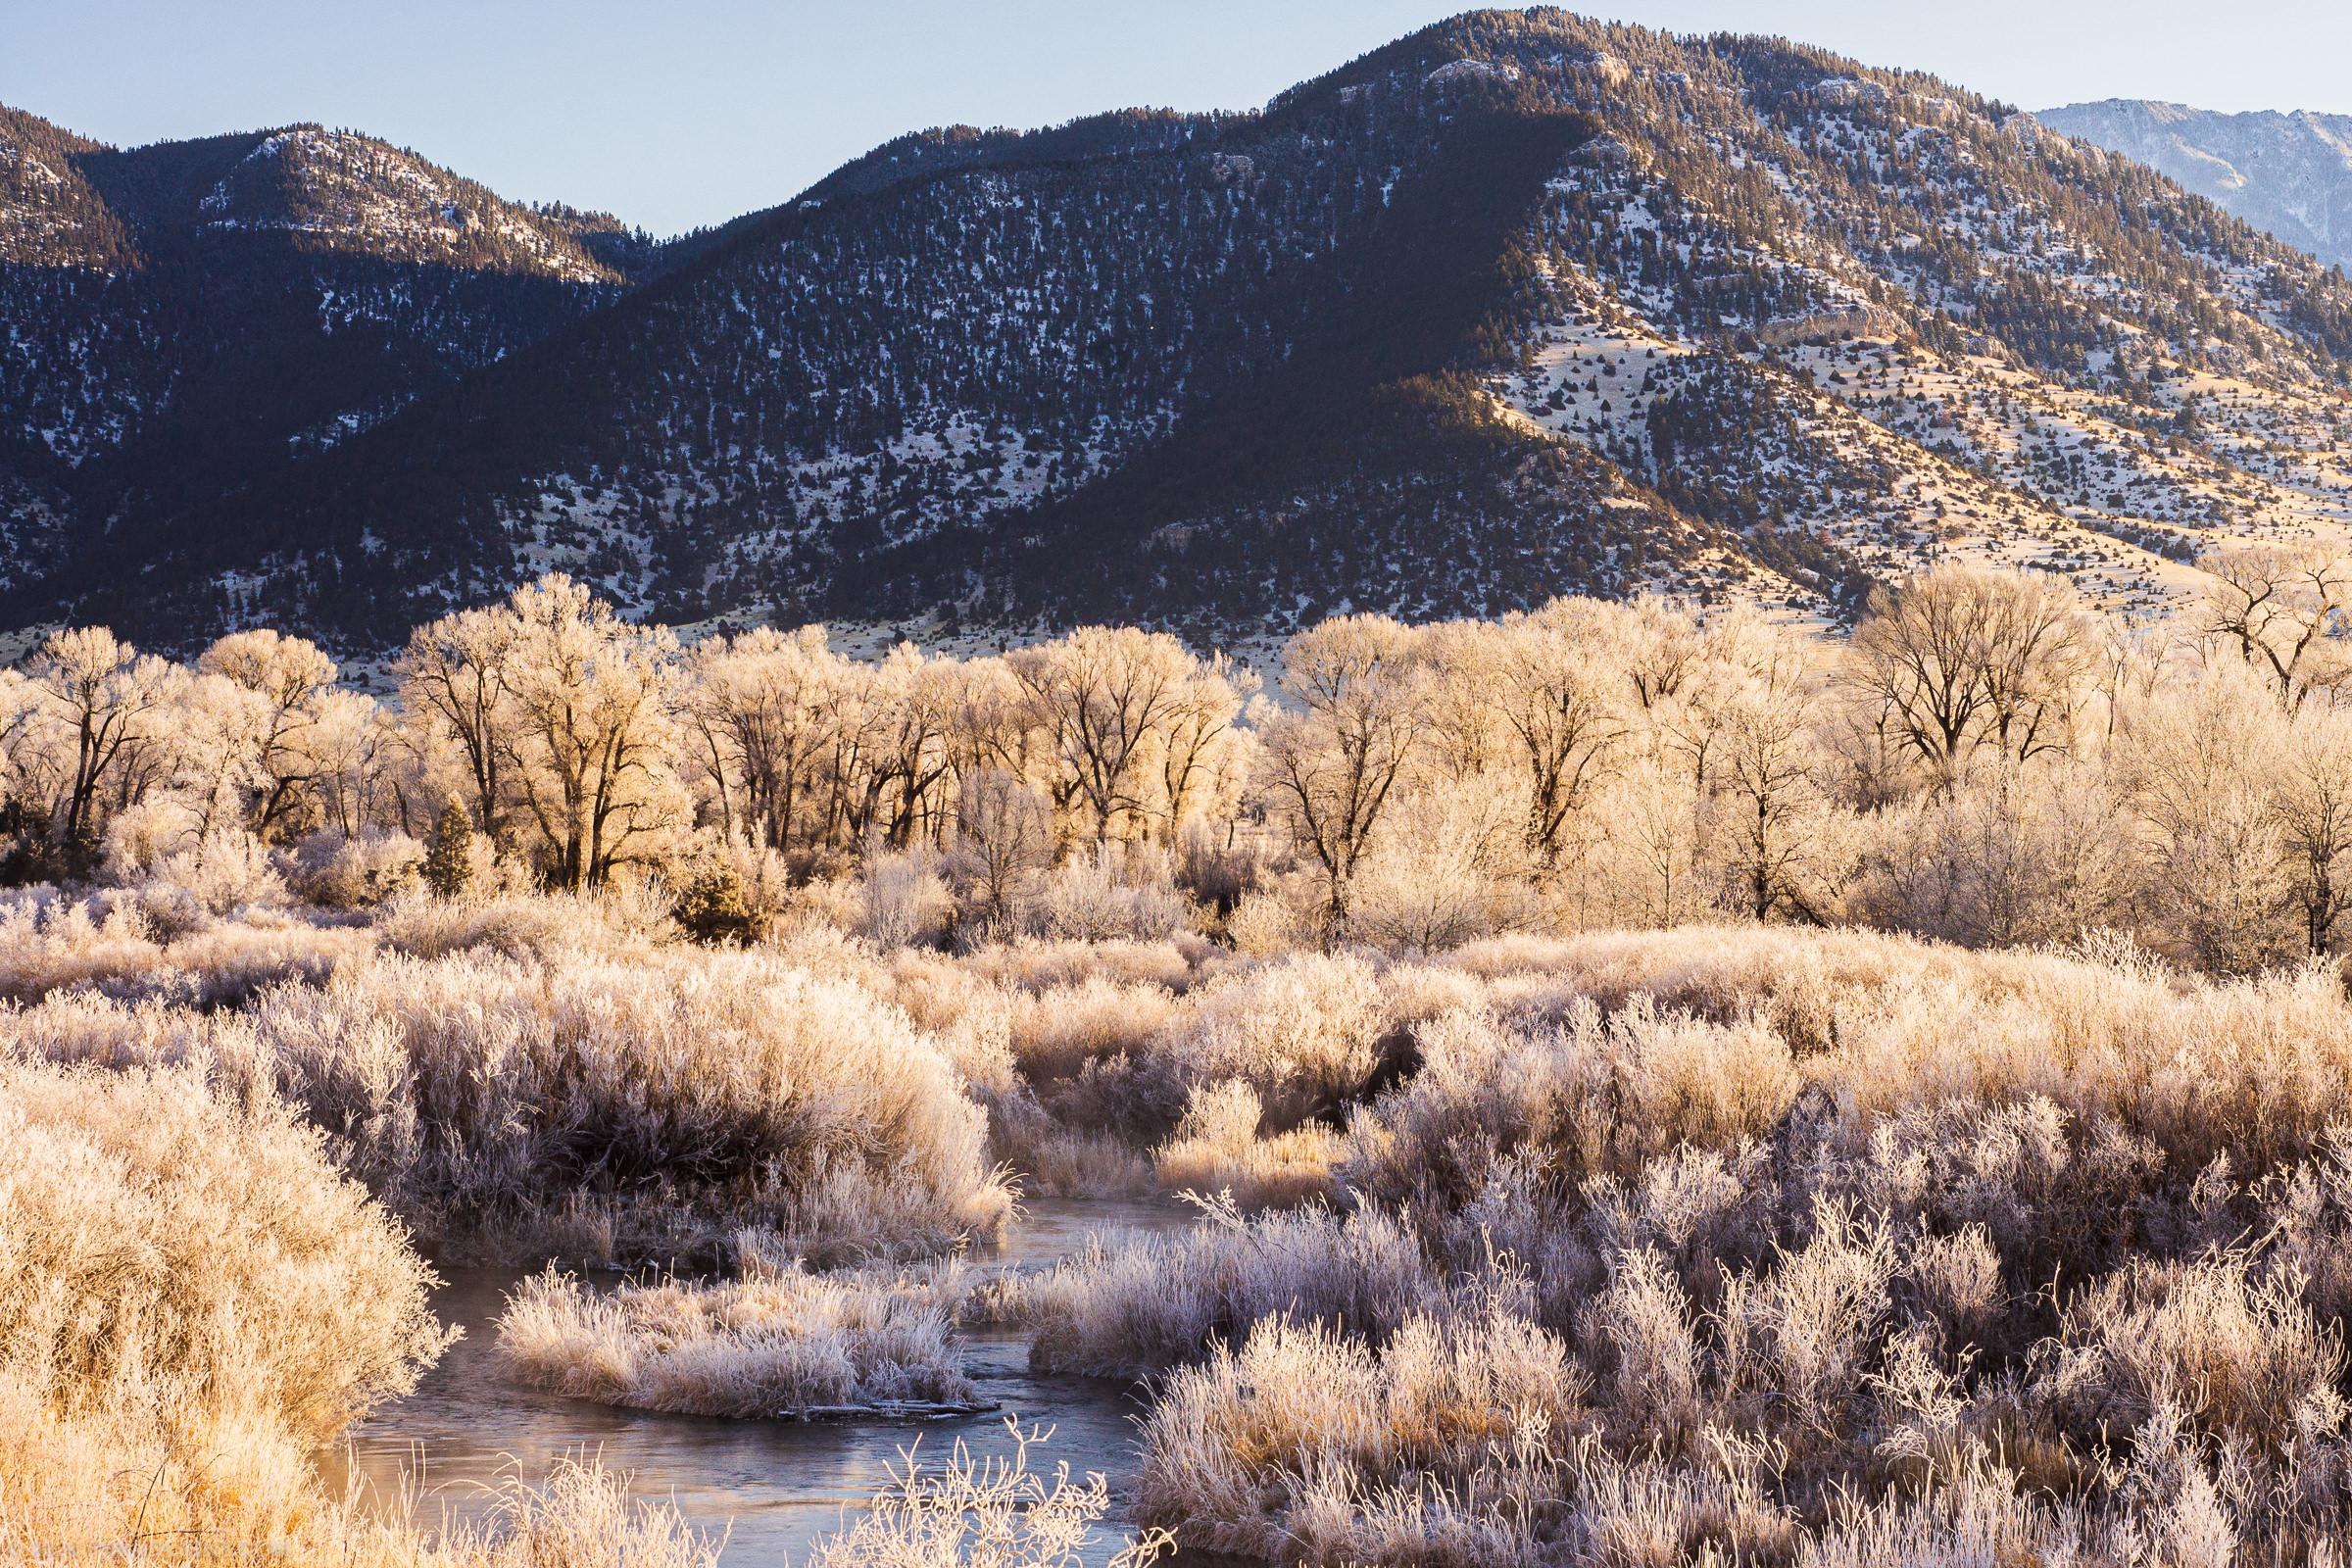 Frozen Yellowstone River Morning